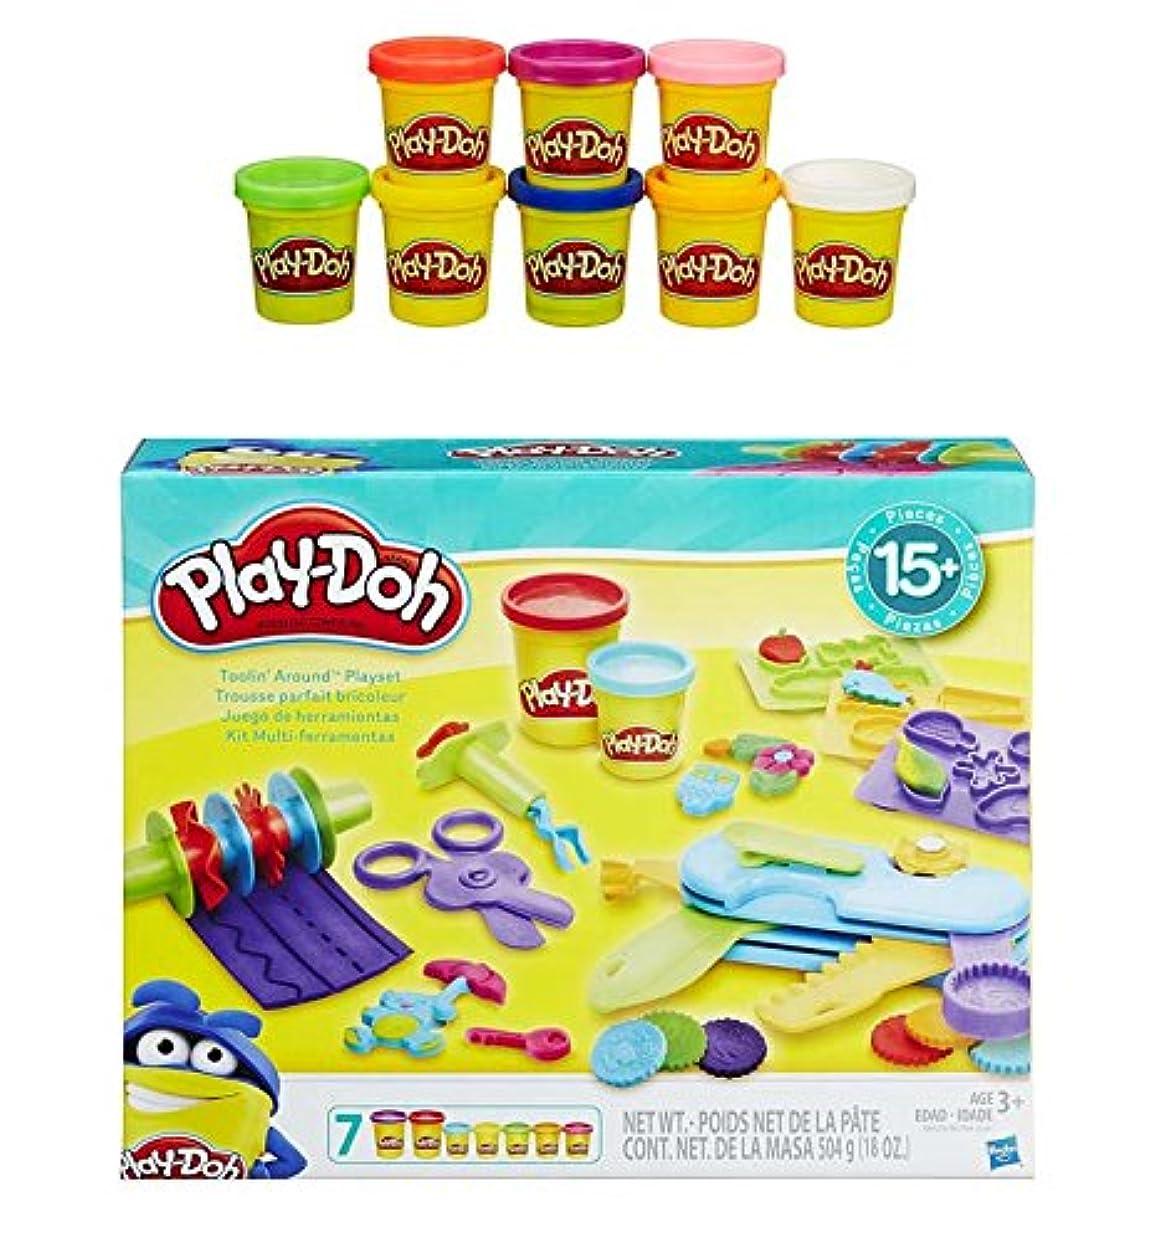 Play-Doh Toolin Around Playset + Play-Doh Rainbow Starter Pack Bundle